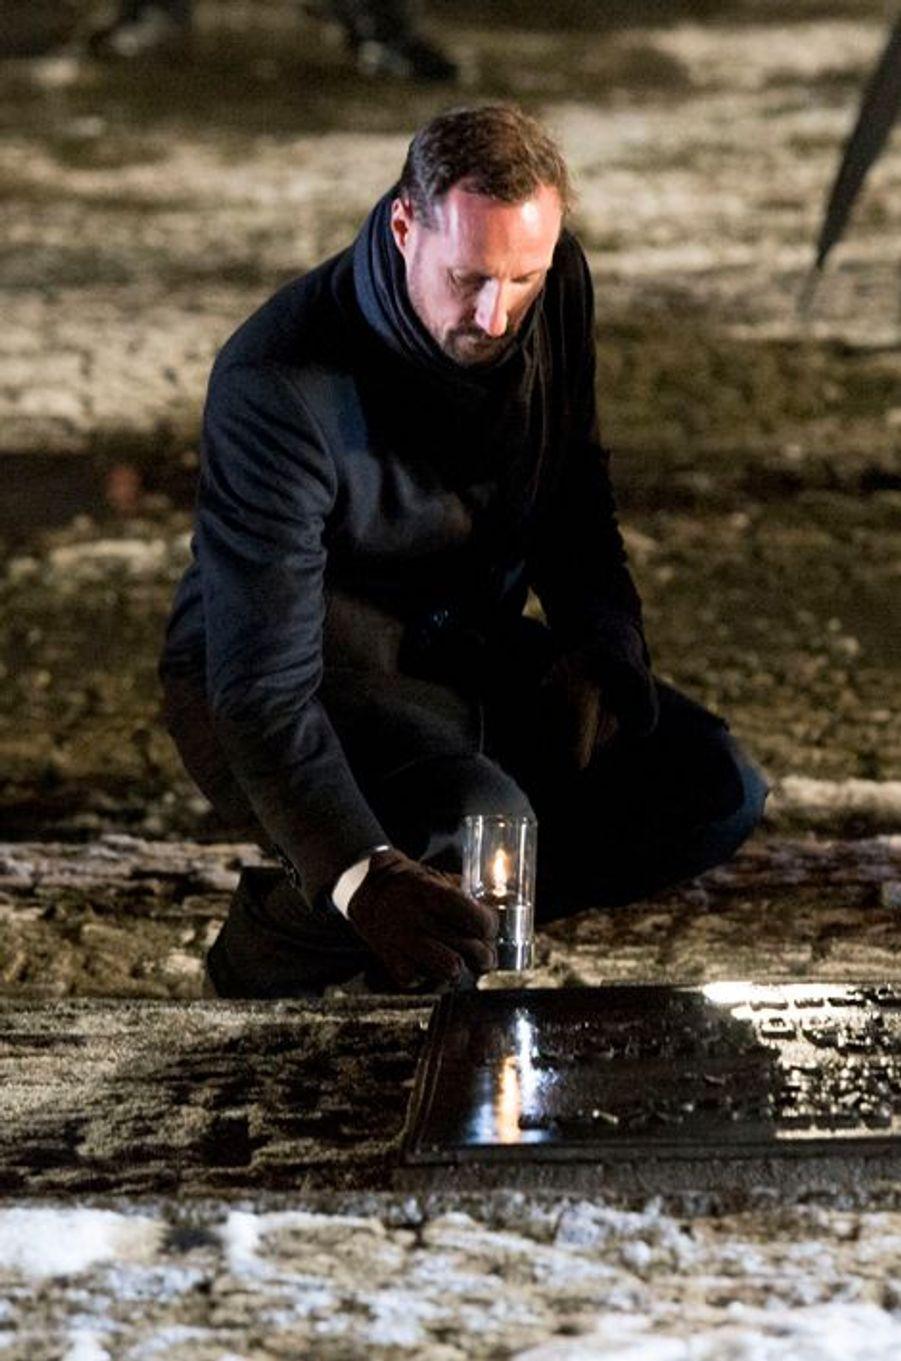 Haakon de Norvège à Auschwitz-Birkenau, le 27 janvier 2015